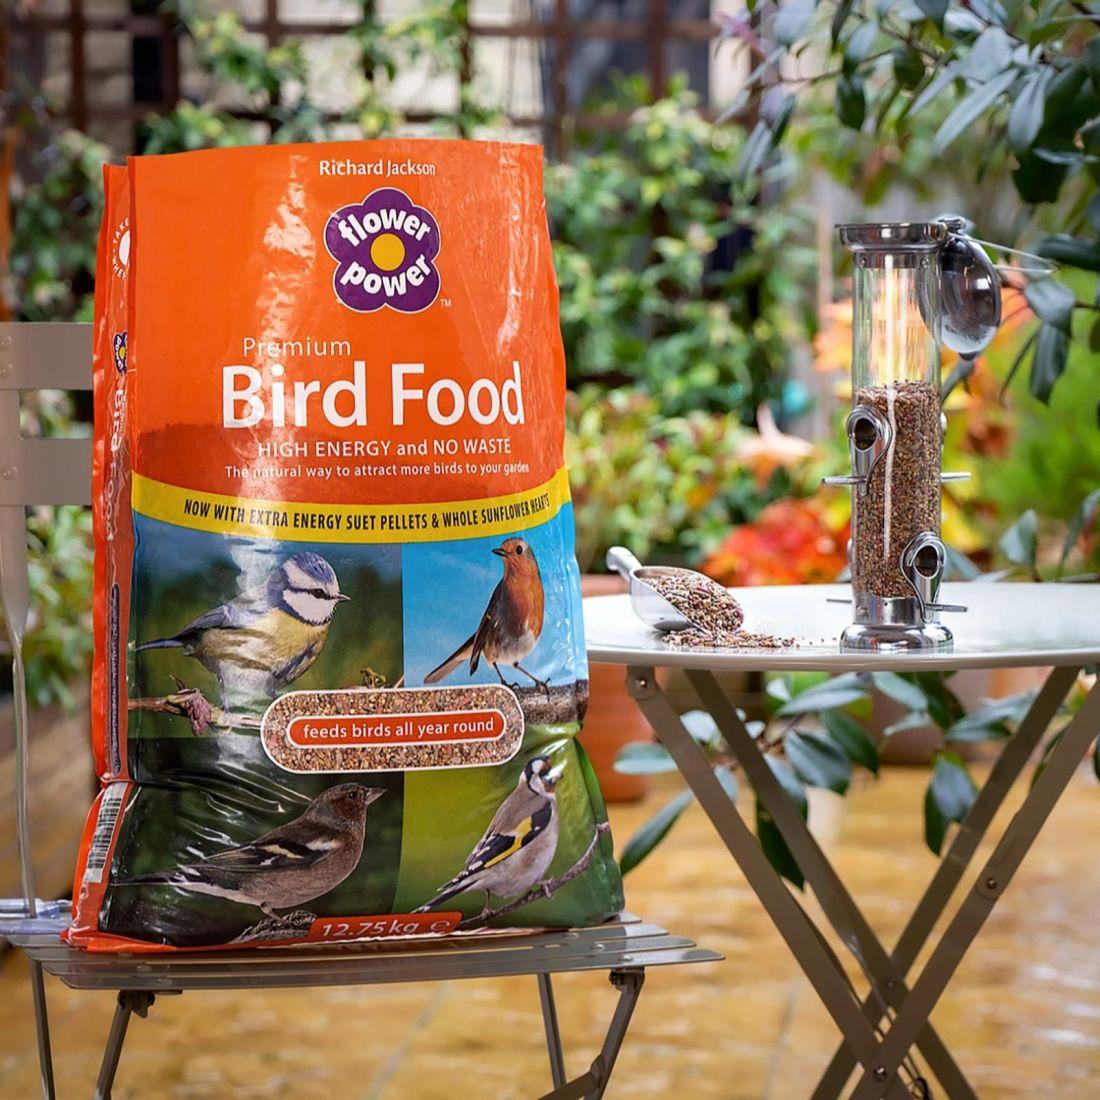 Richard Jackson High Energy Bird Food